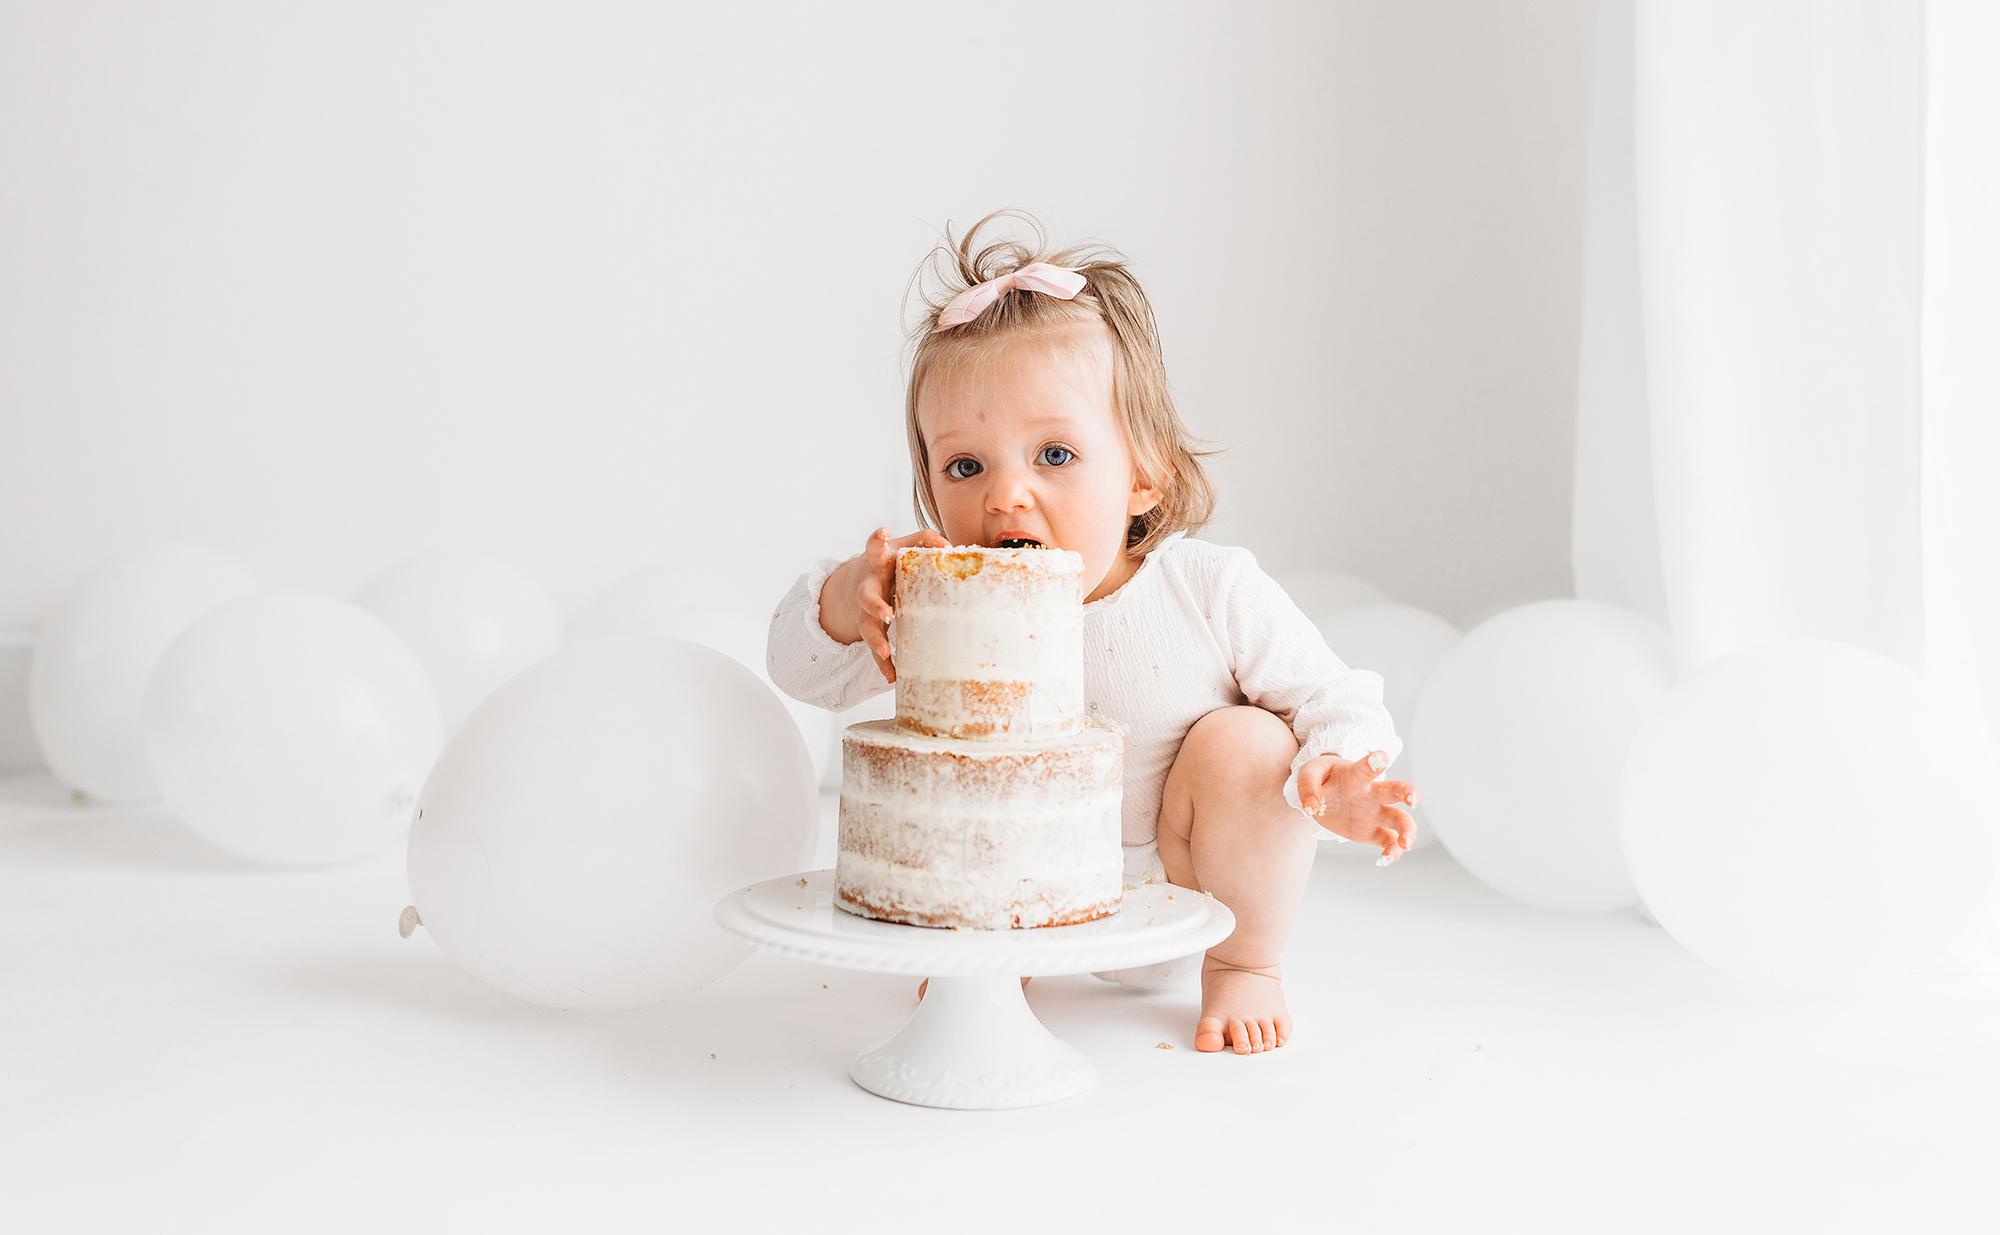 Cake Smash Photographer Barnsley with baby diving into cake